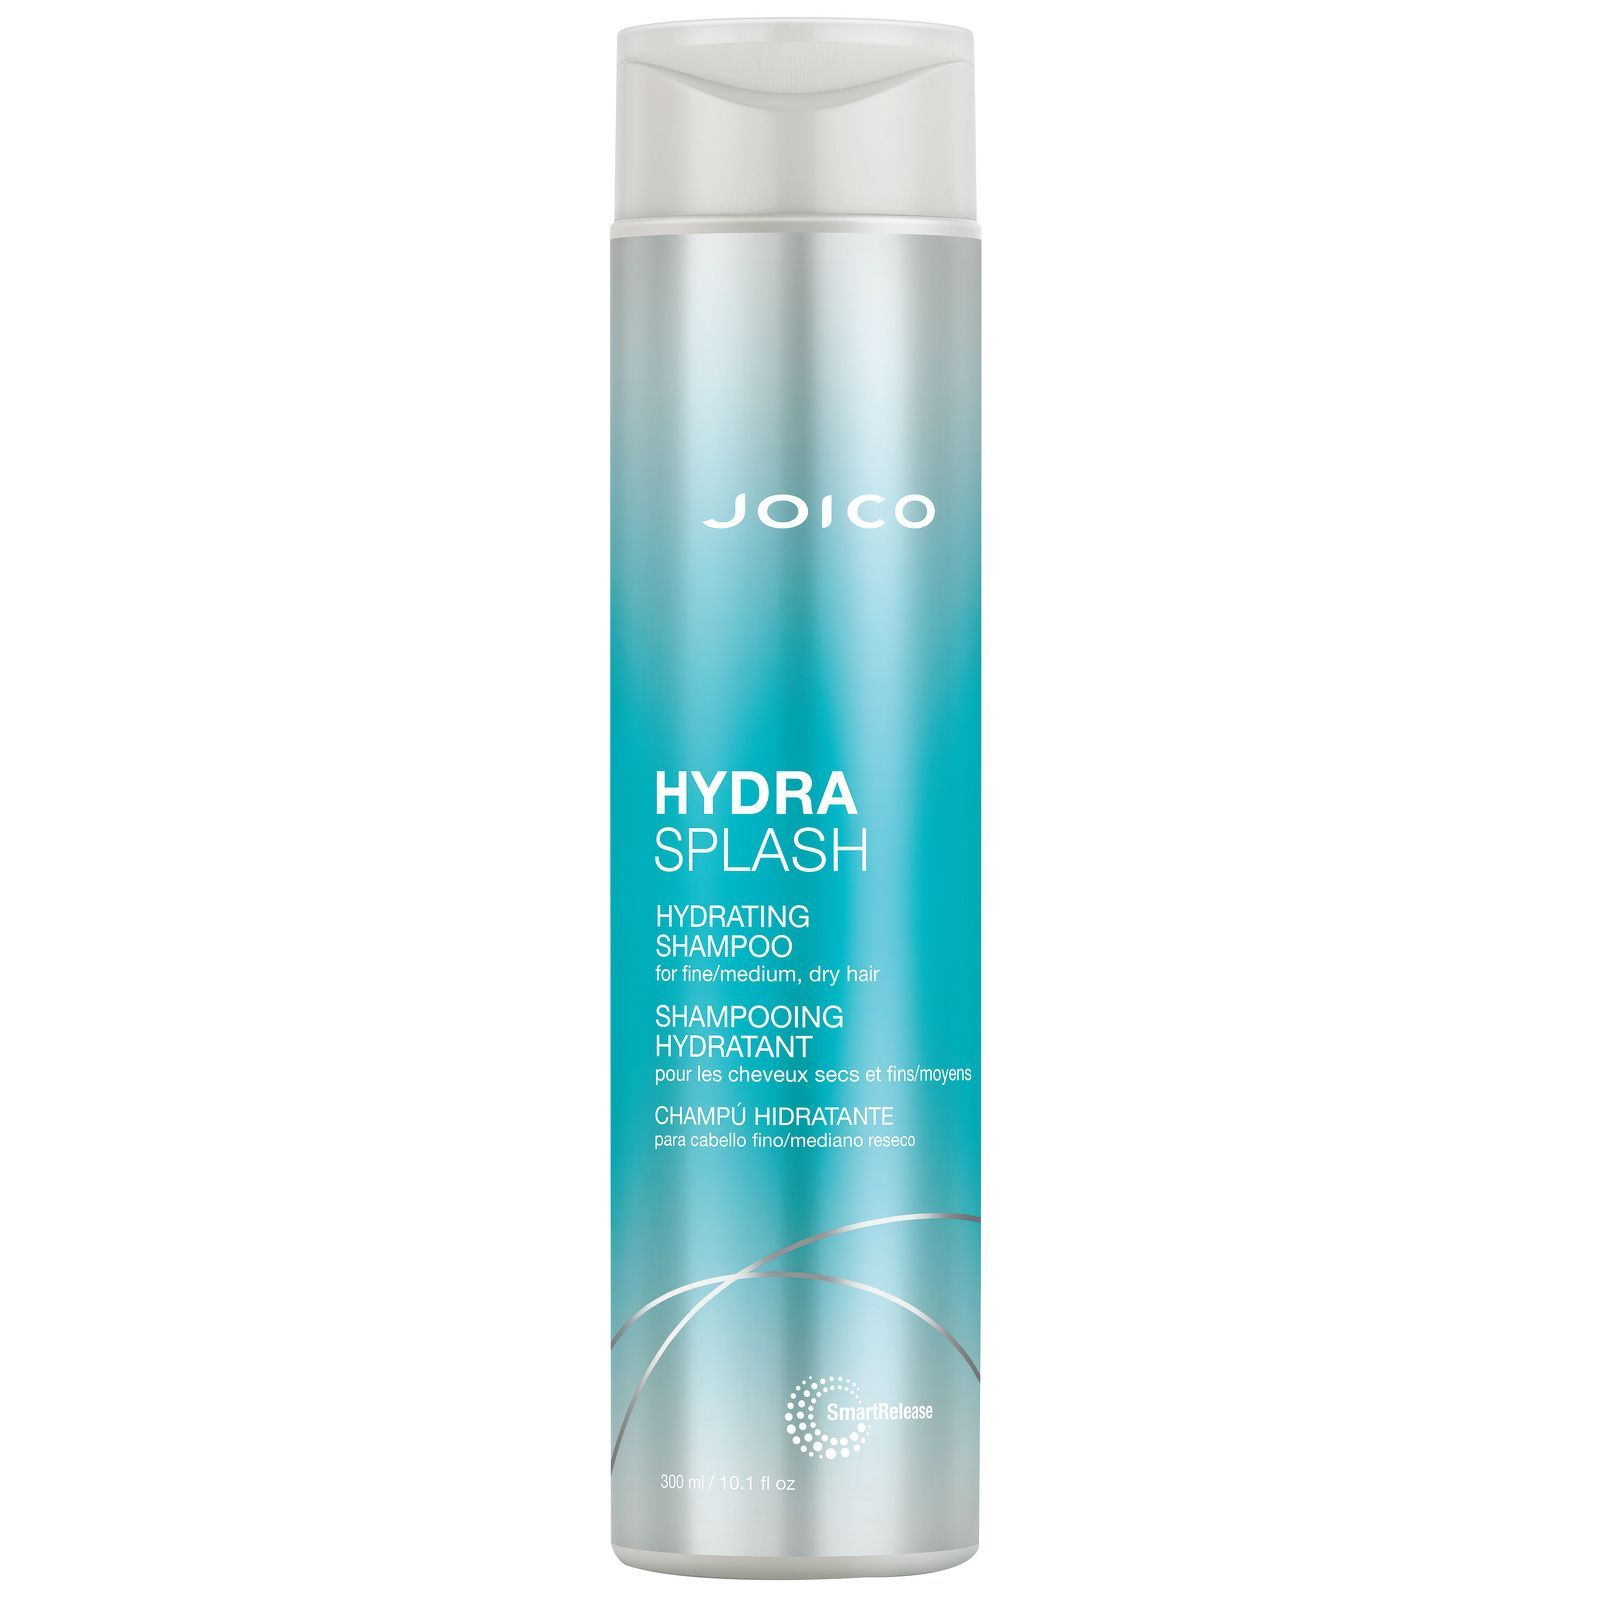 Joico Hydrasplash Hydrating Shampoo - 300ml